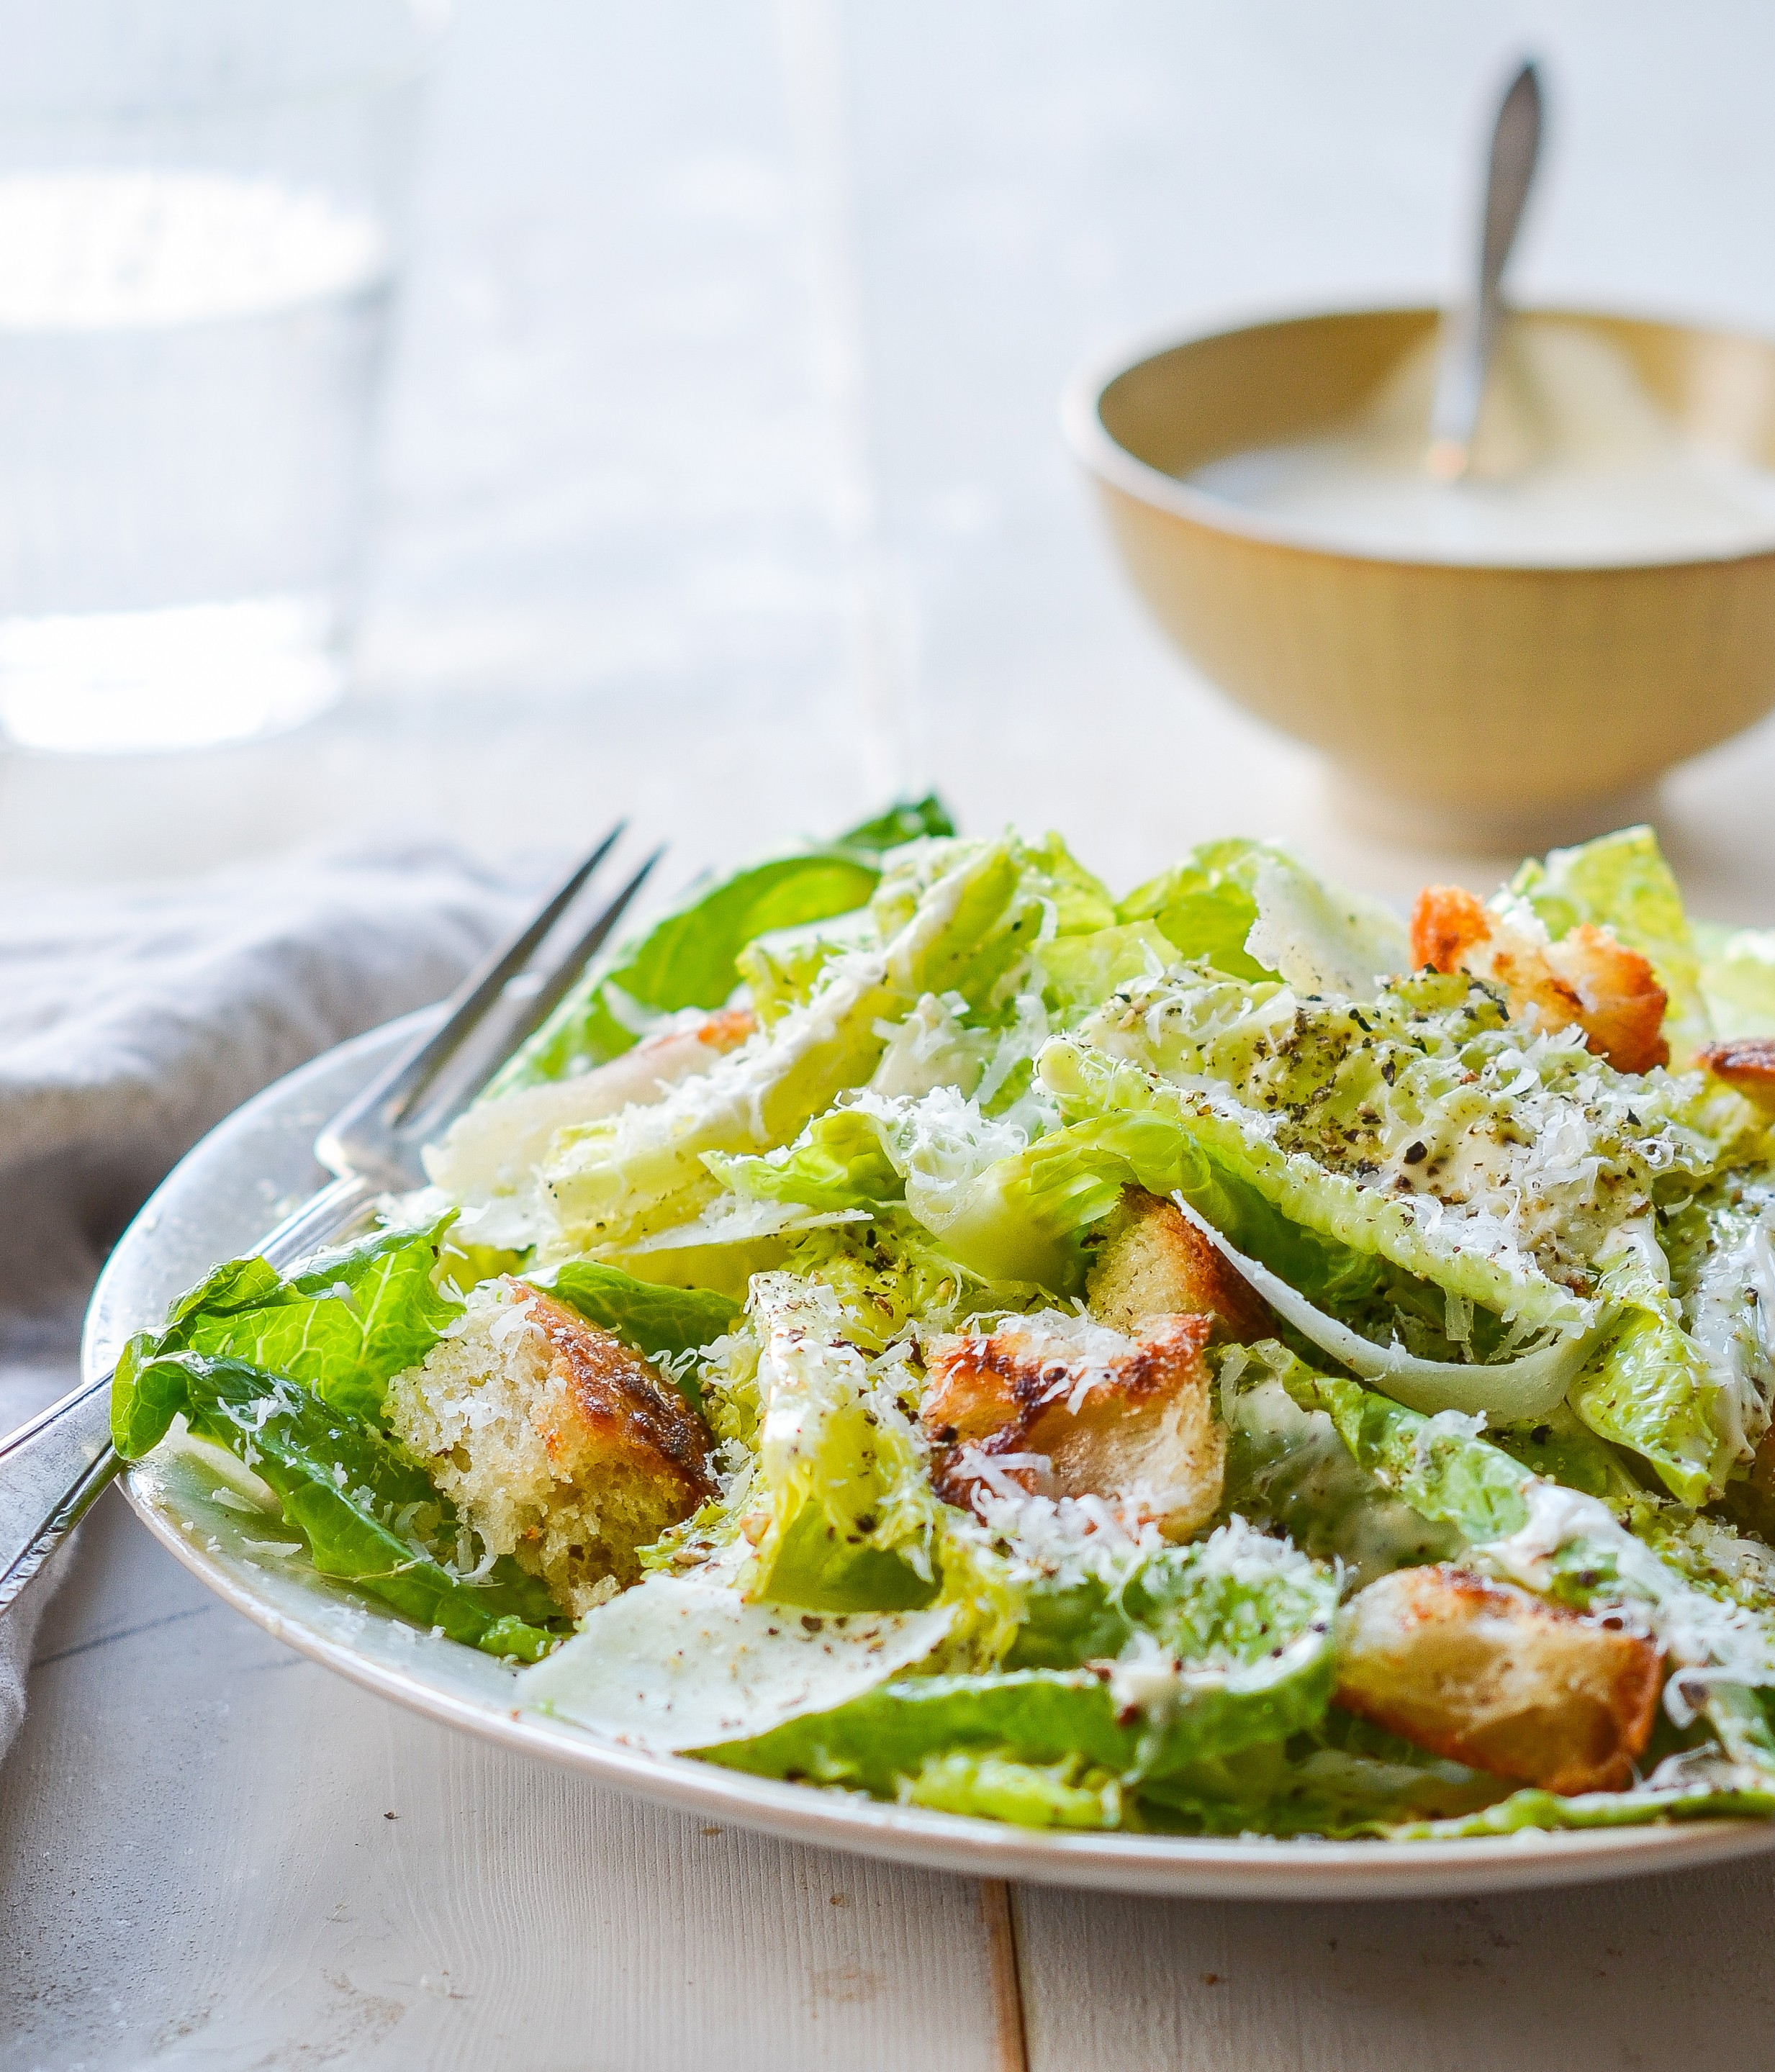 homemade-caesar-salad-dressing.jpg